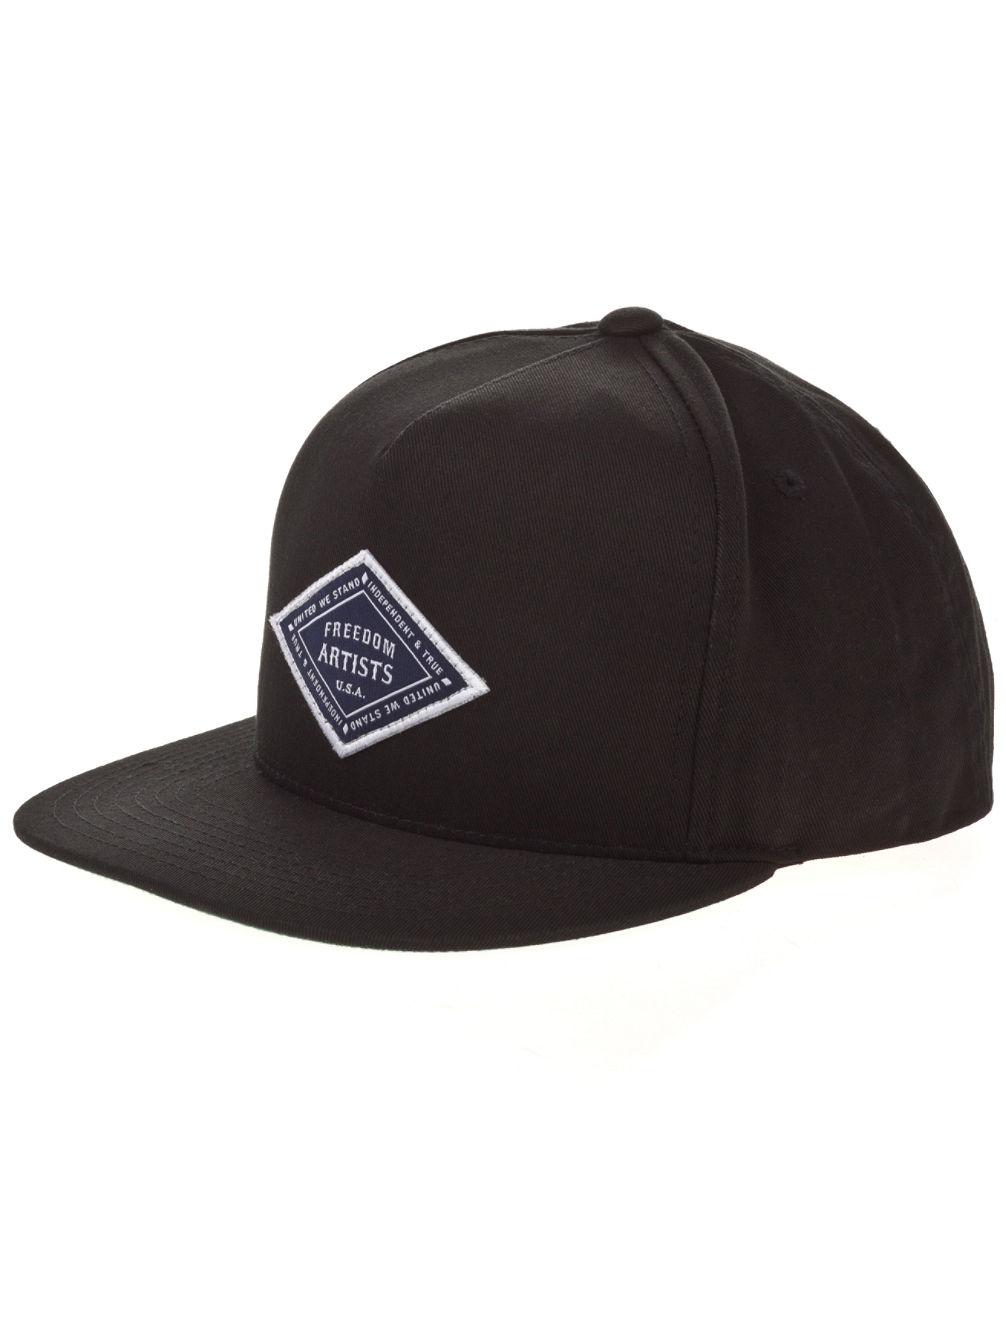 standard-snapback-cap